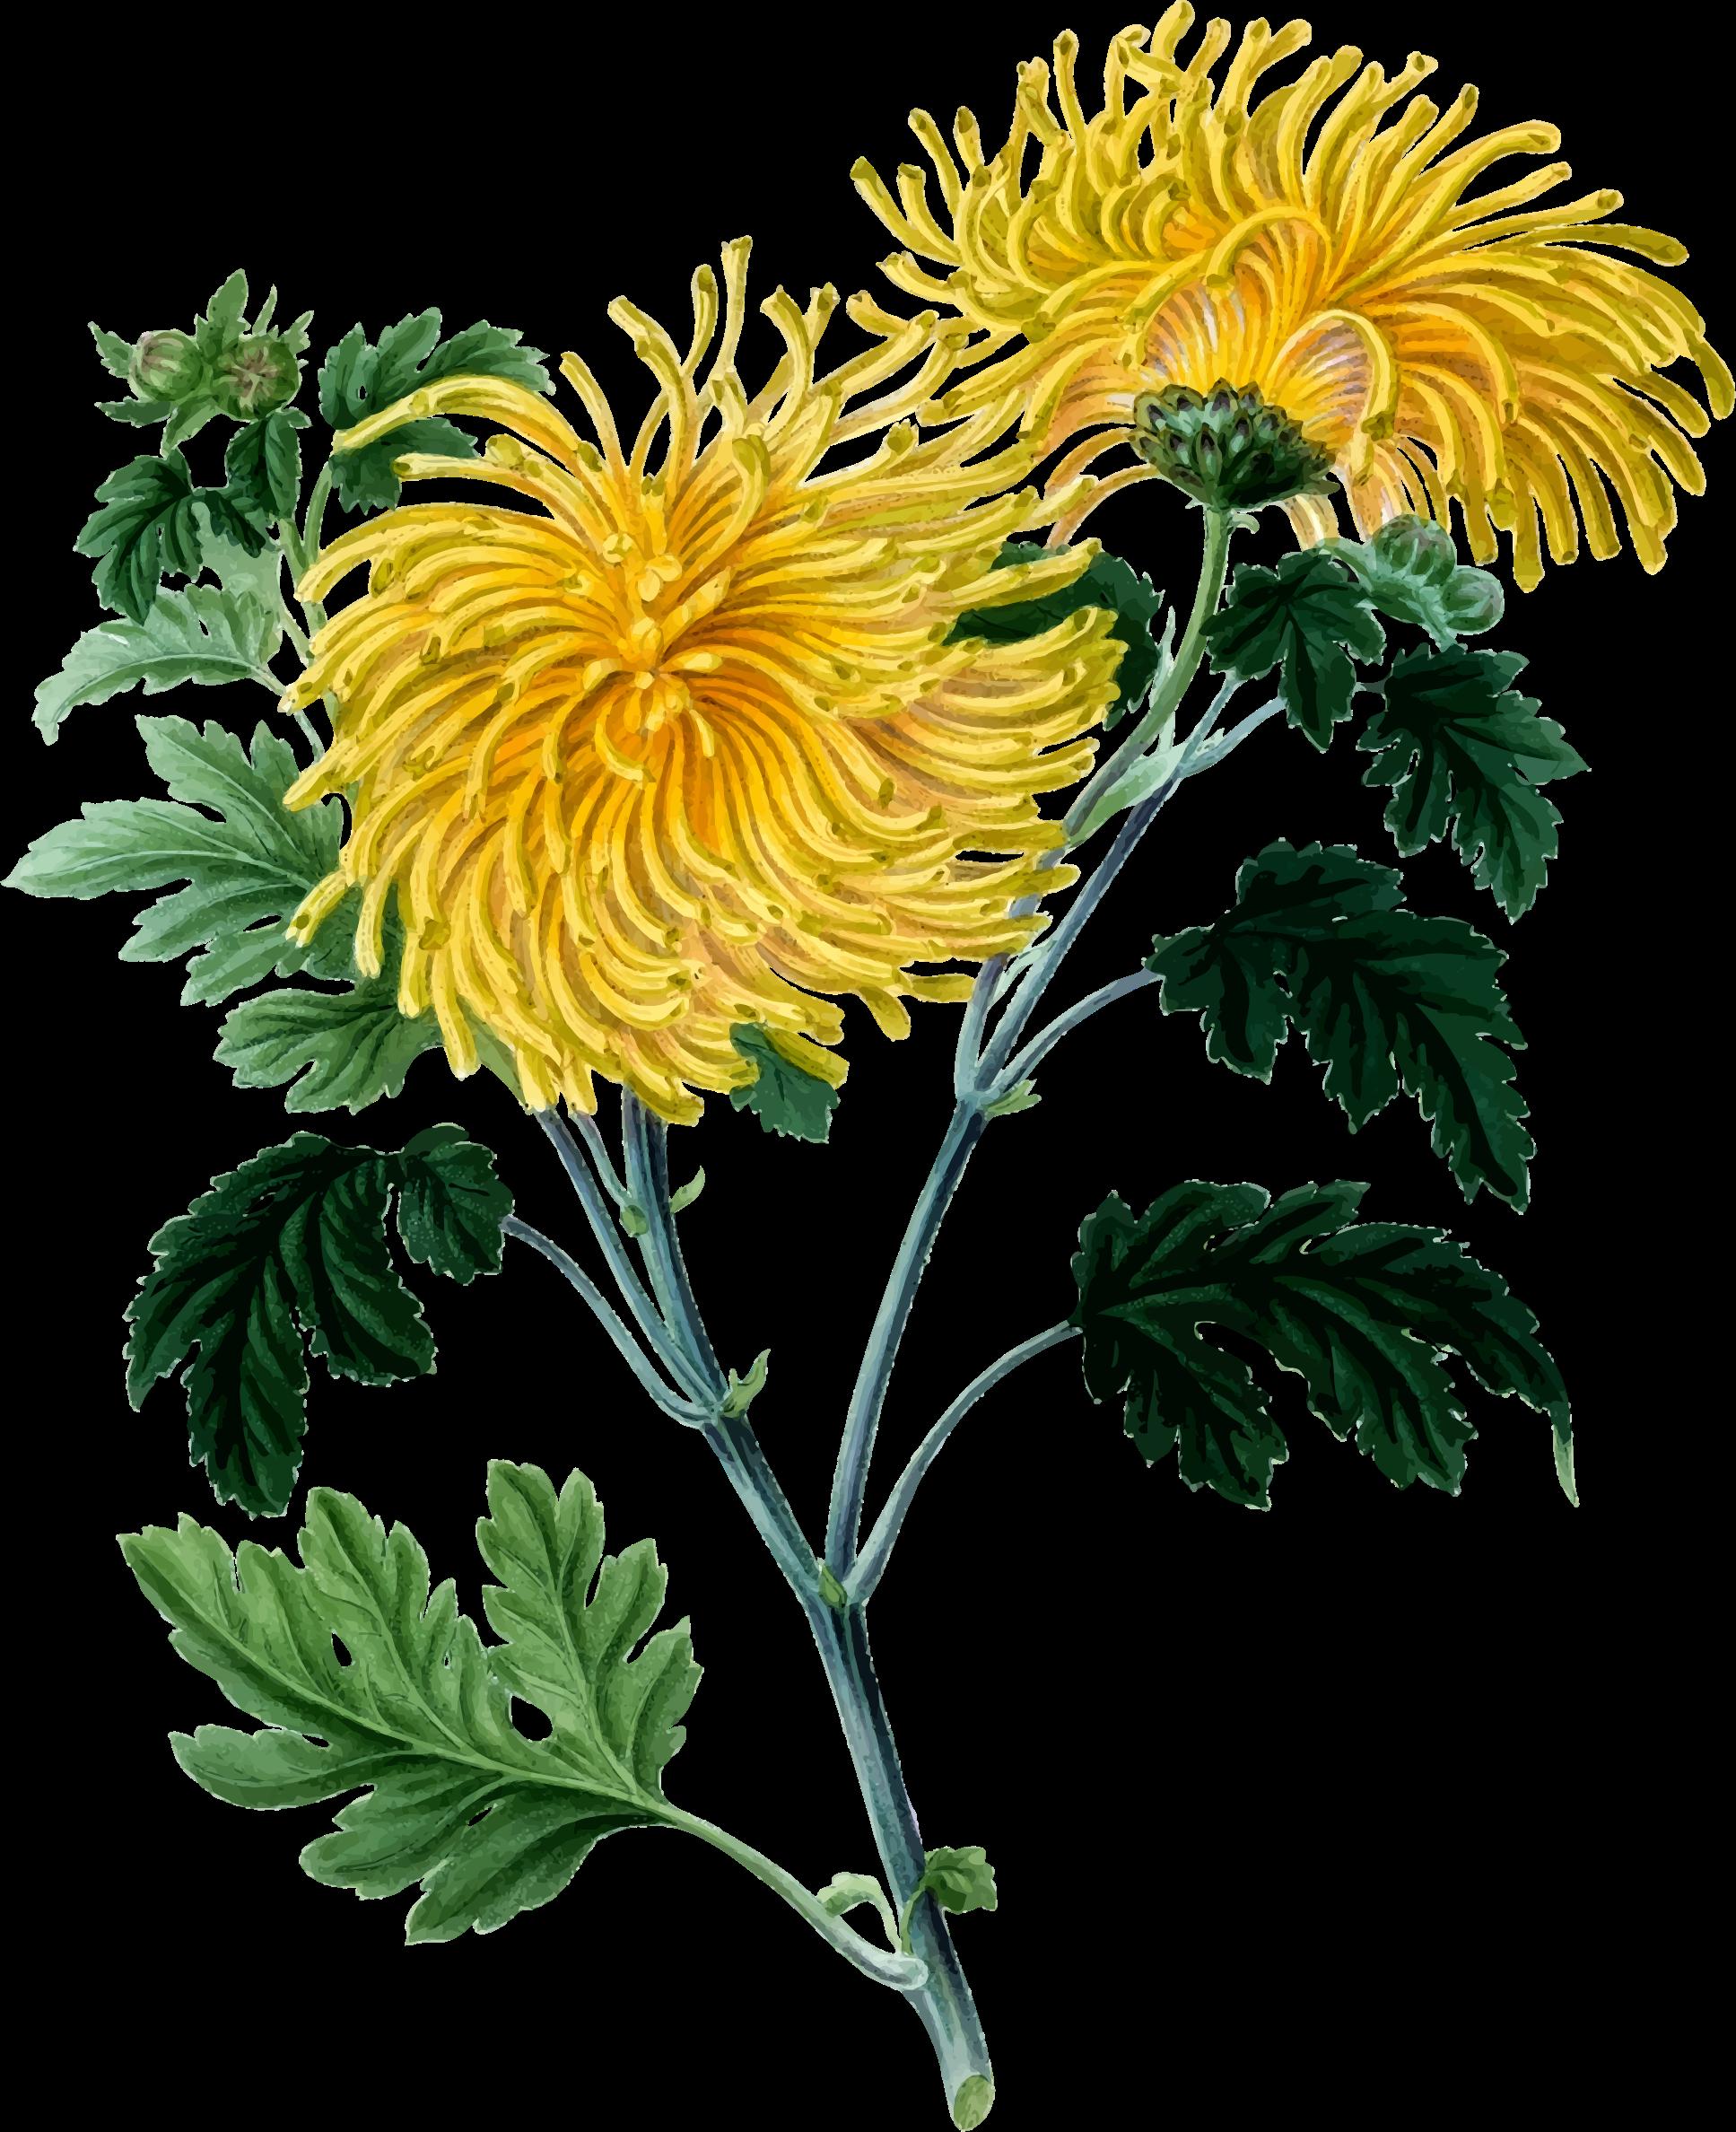 Yellow Flower clipart chrysanthemums Clipart Chrysanthemum 2 2 Chrysanthemum